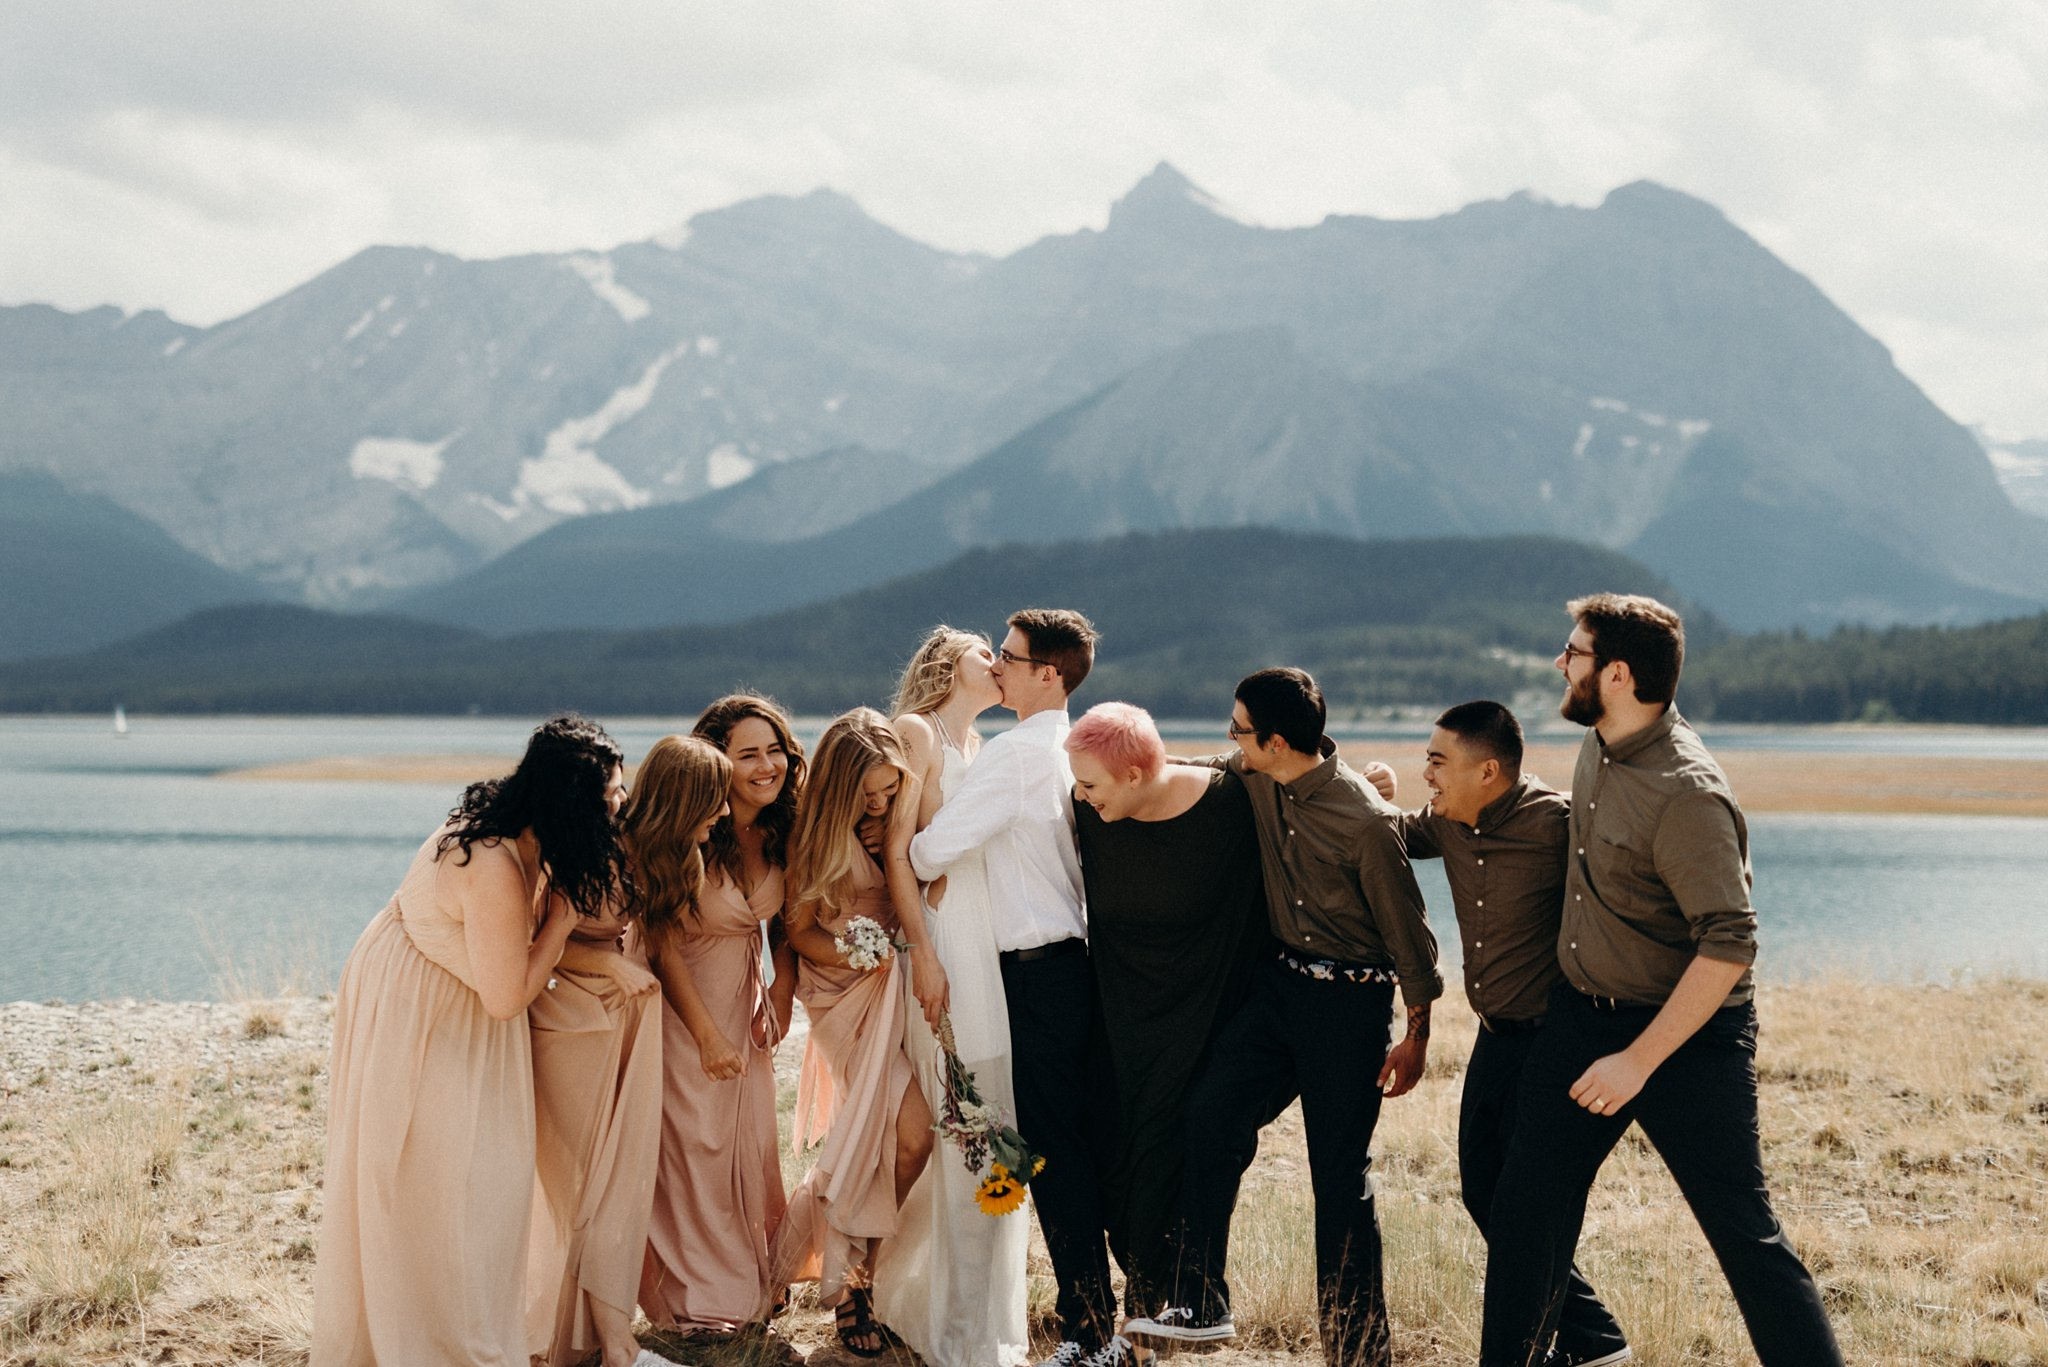 kaihla_tonai_intimate_wedding_elopement_photographer_6393.jpg